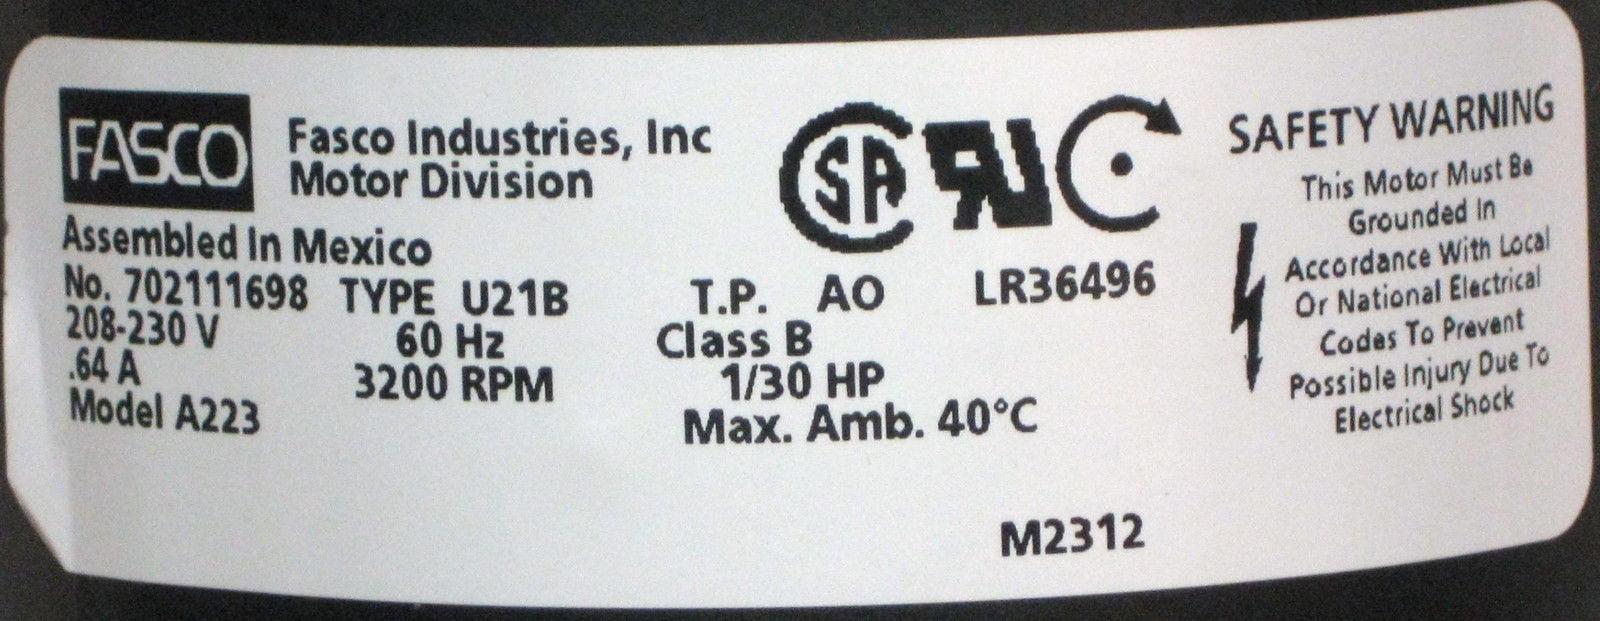 York (026-33999-001, 7021-9656, 7021-10096) Furnace Draft Inducer Fasco #  A223